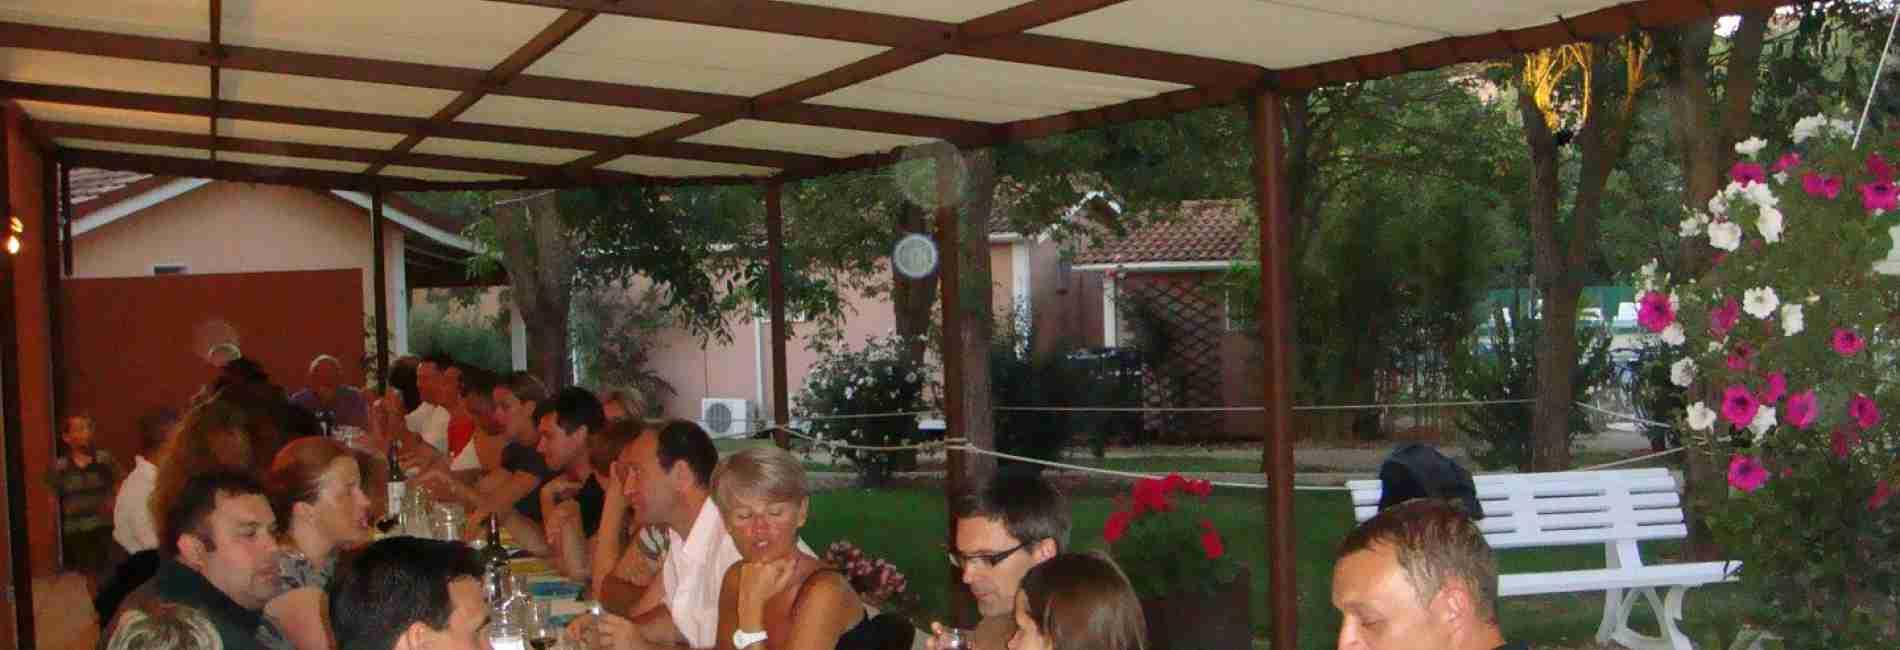 terrasse-village-de-gîtes.jpg